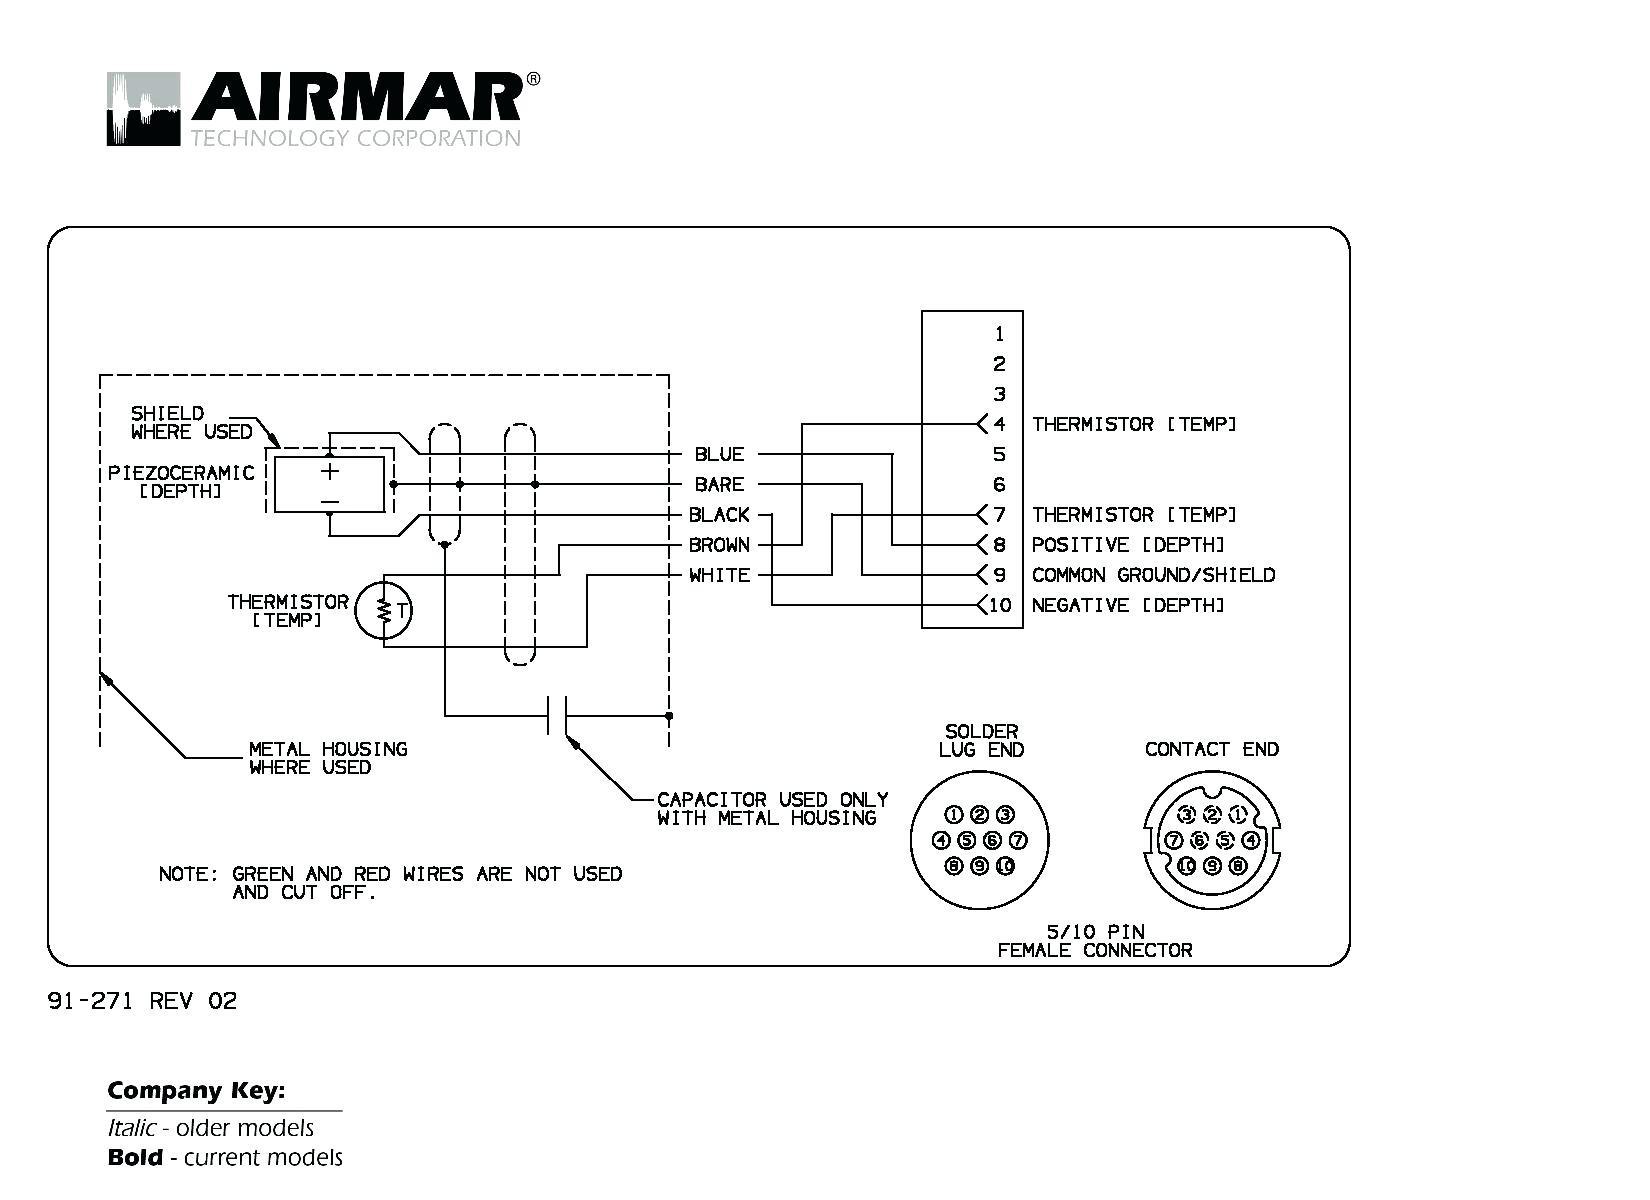 Garmin Power Wiring Diagram - Wiring Diagram G11 on